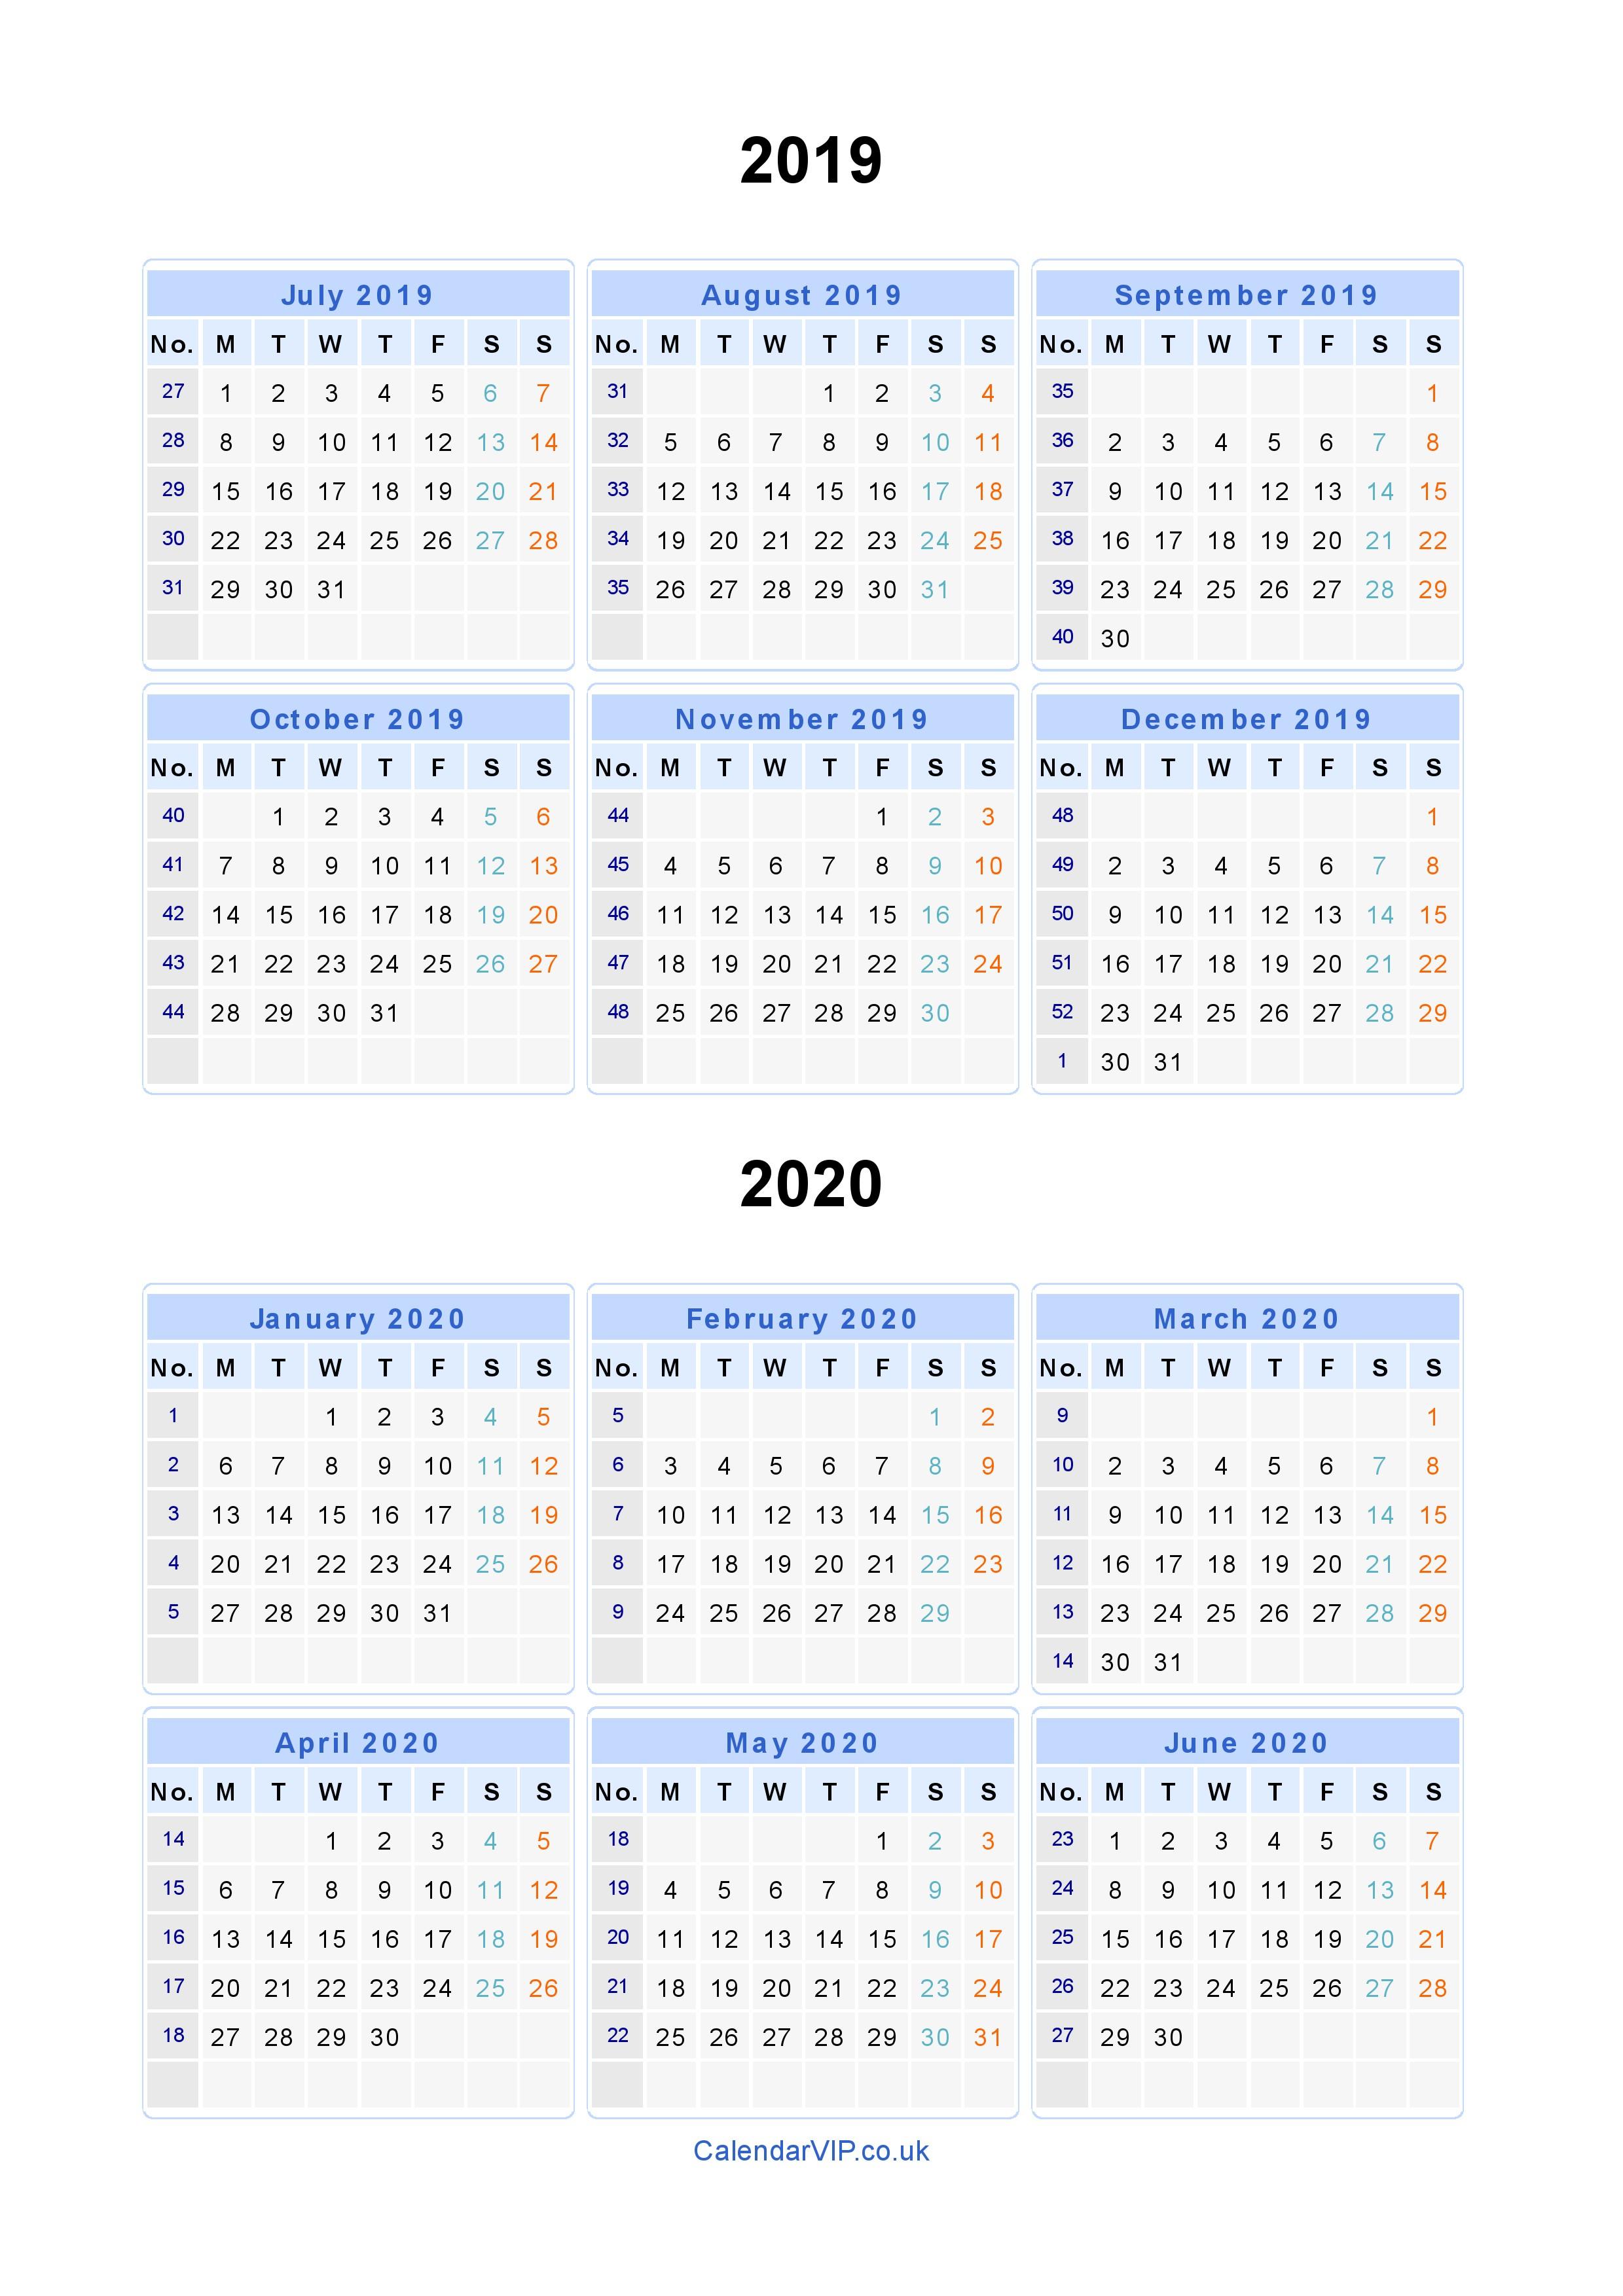 Split Year Calendars 2019 2020 - Calendar From July 2019 To June 2020 regarding 2019-2020 Calendar Printable Free No Download